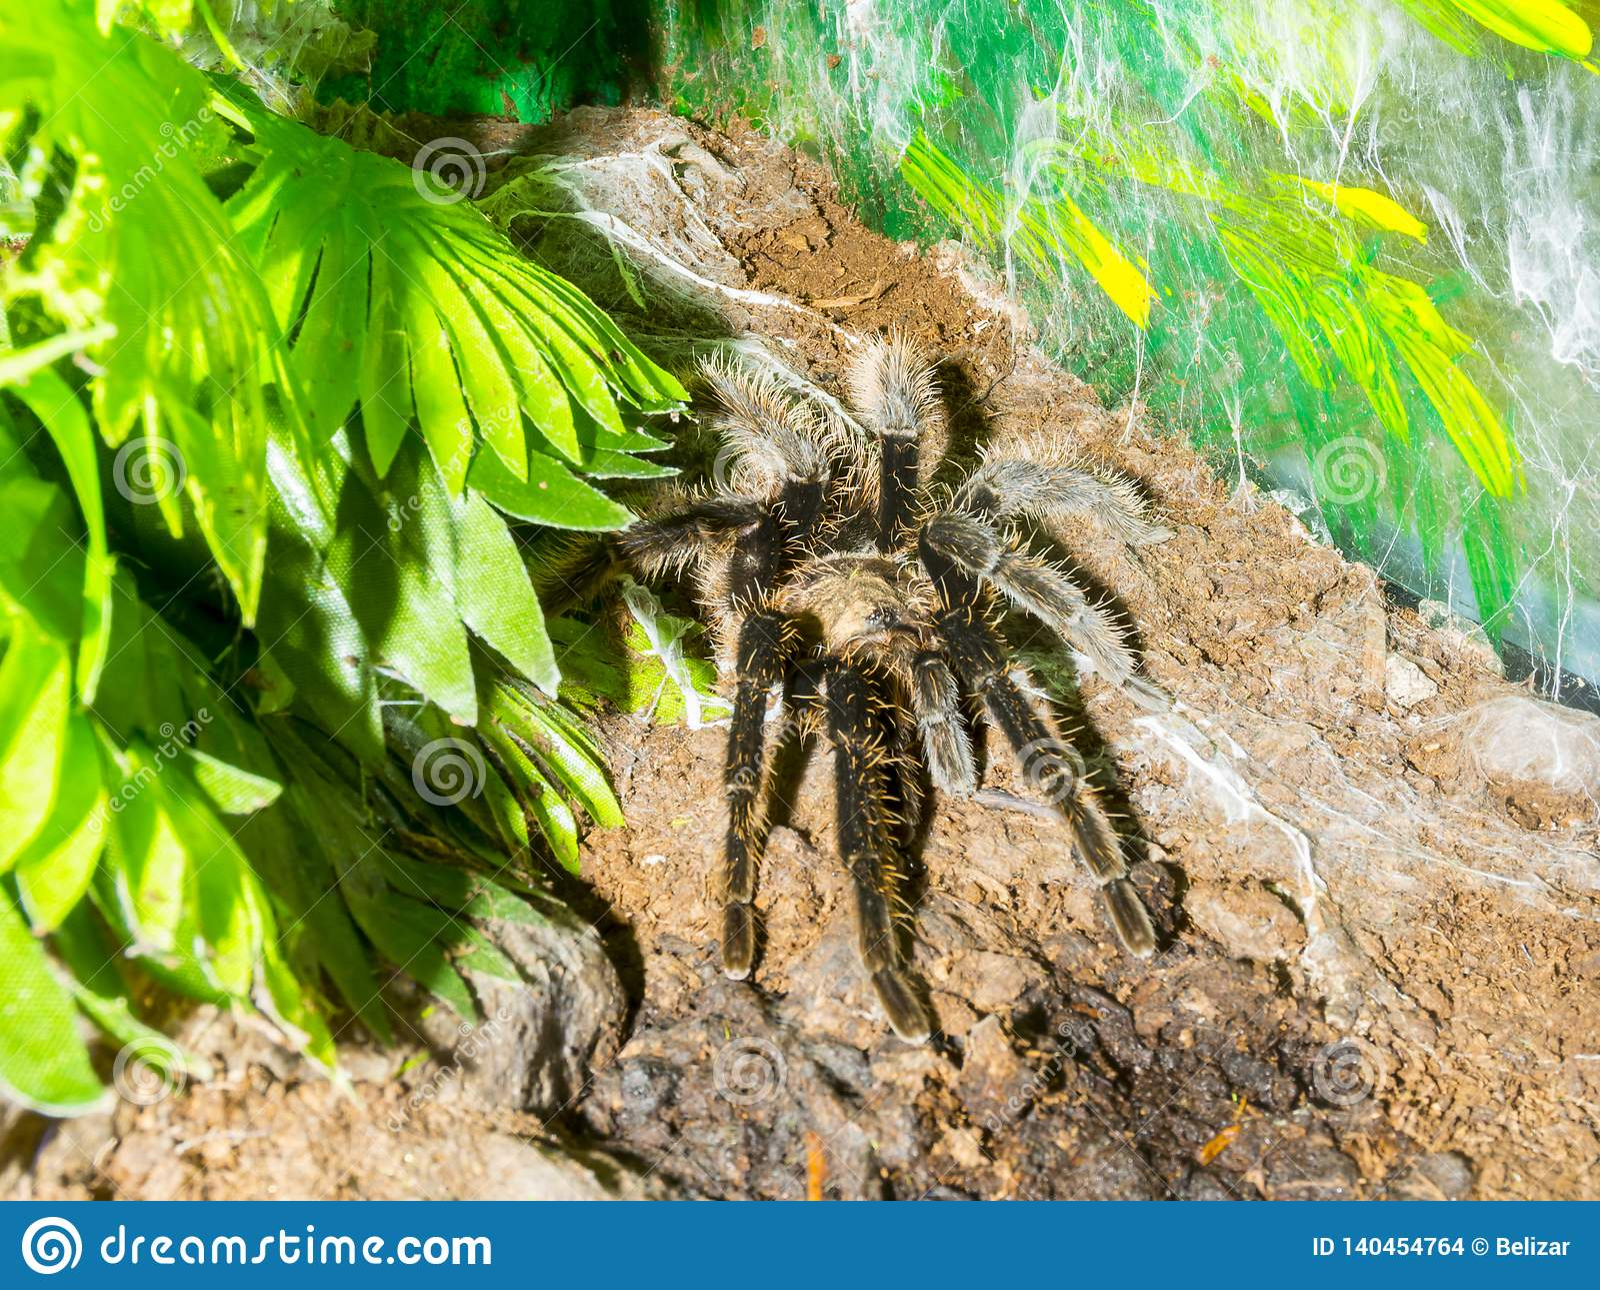 Curlyhair tarantula on the ground